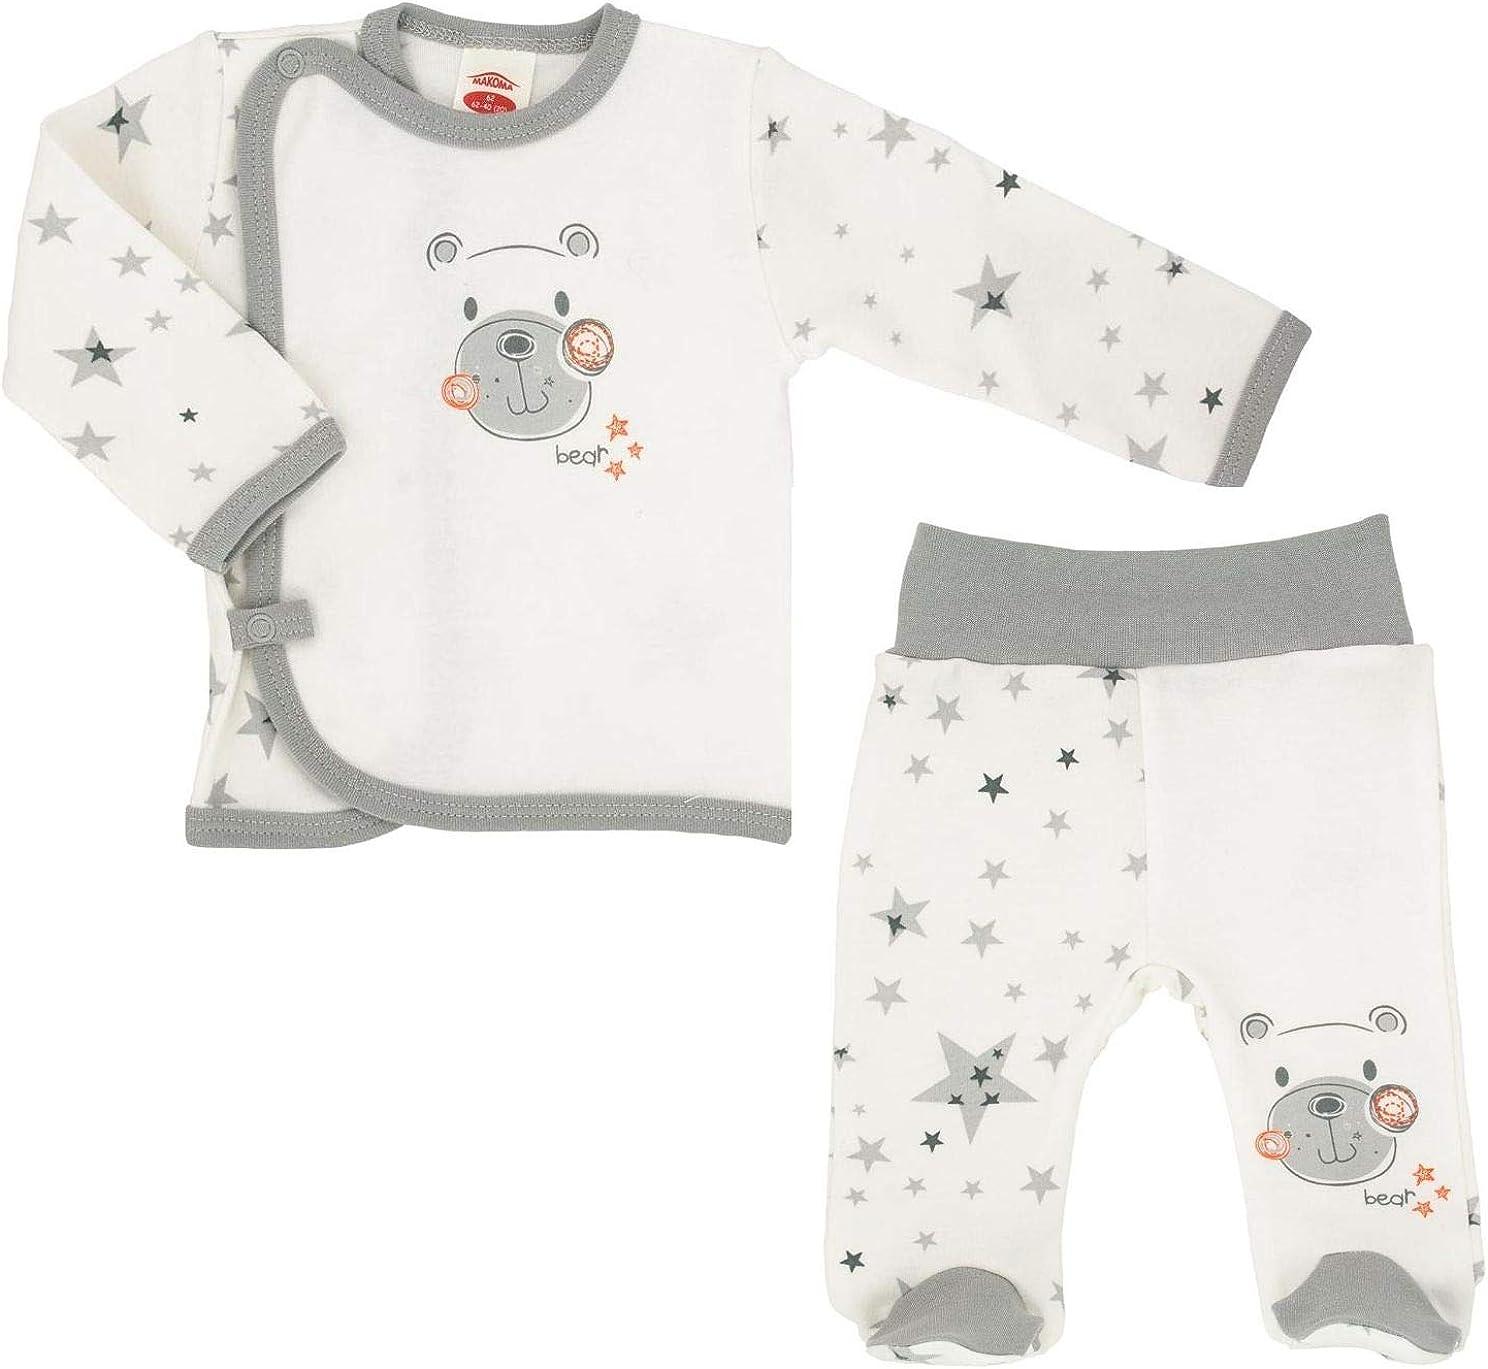 TupTam Baby Romper Clothing Set 2-Piece